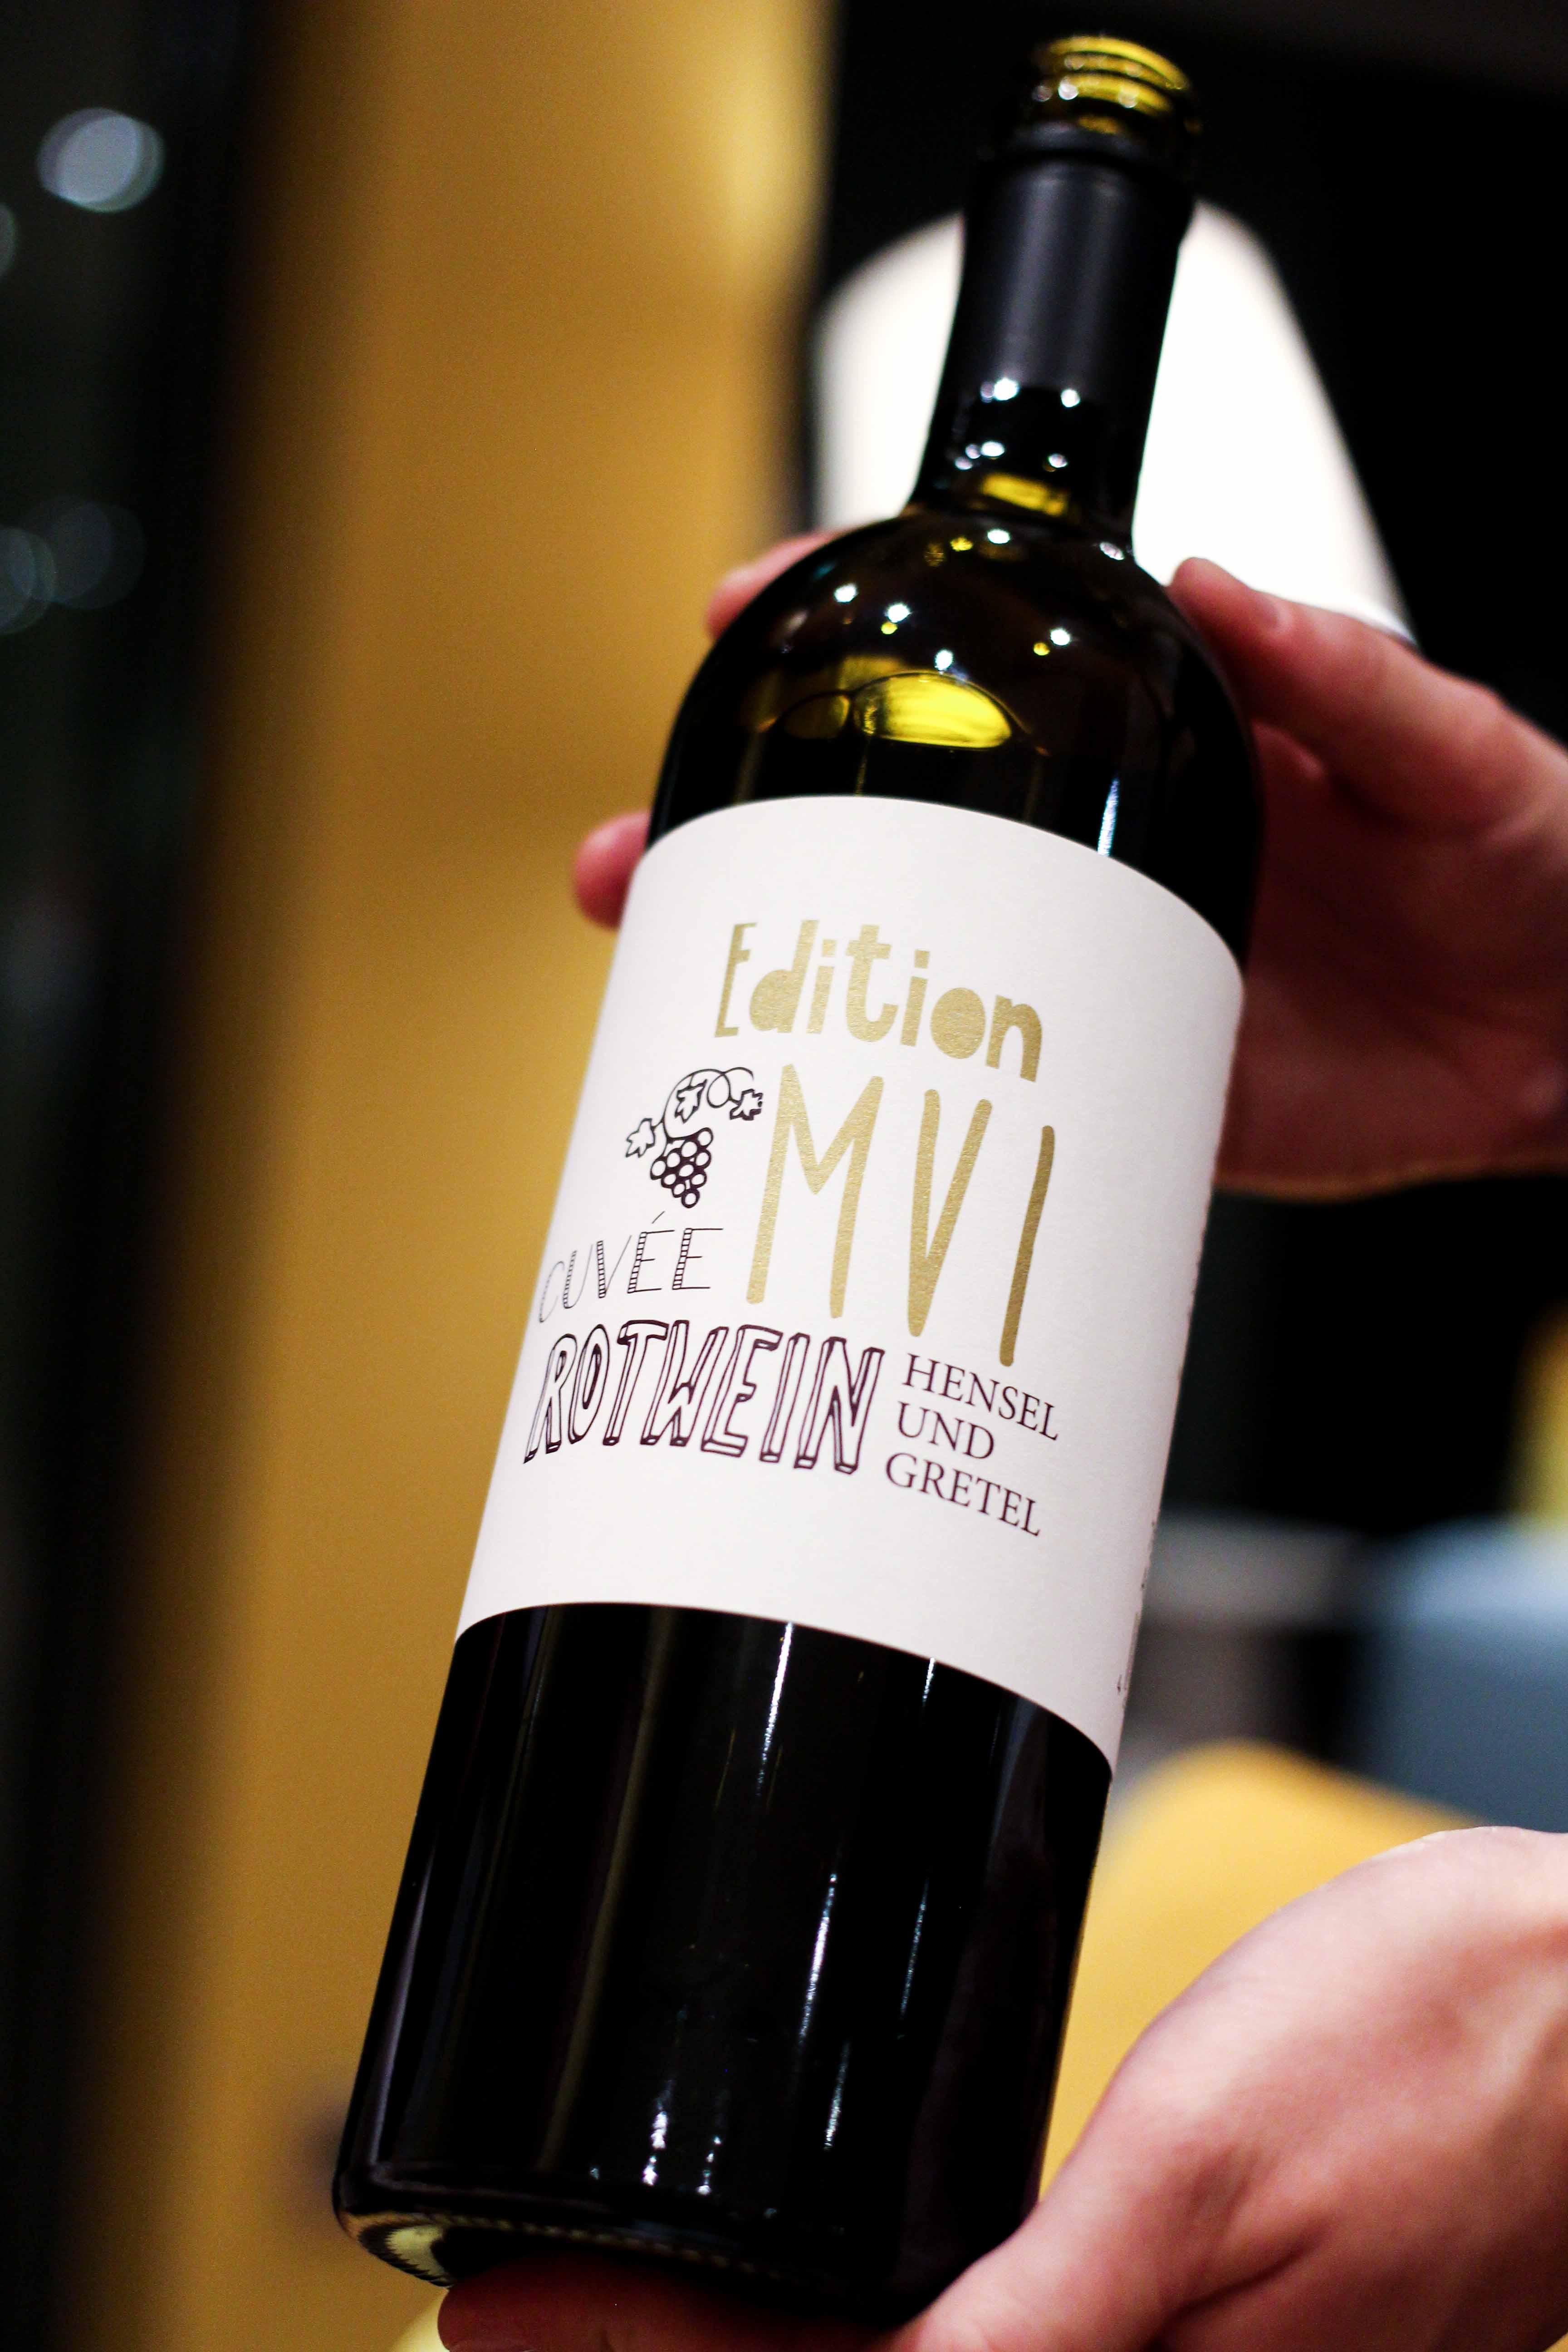 Mercure Weinlese Reiseblog Weinprobe Mercure Mannheim Rotwein MVI M6